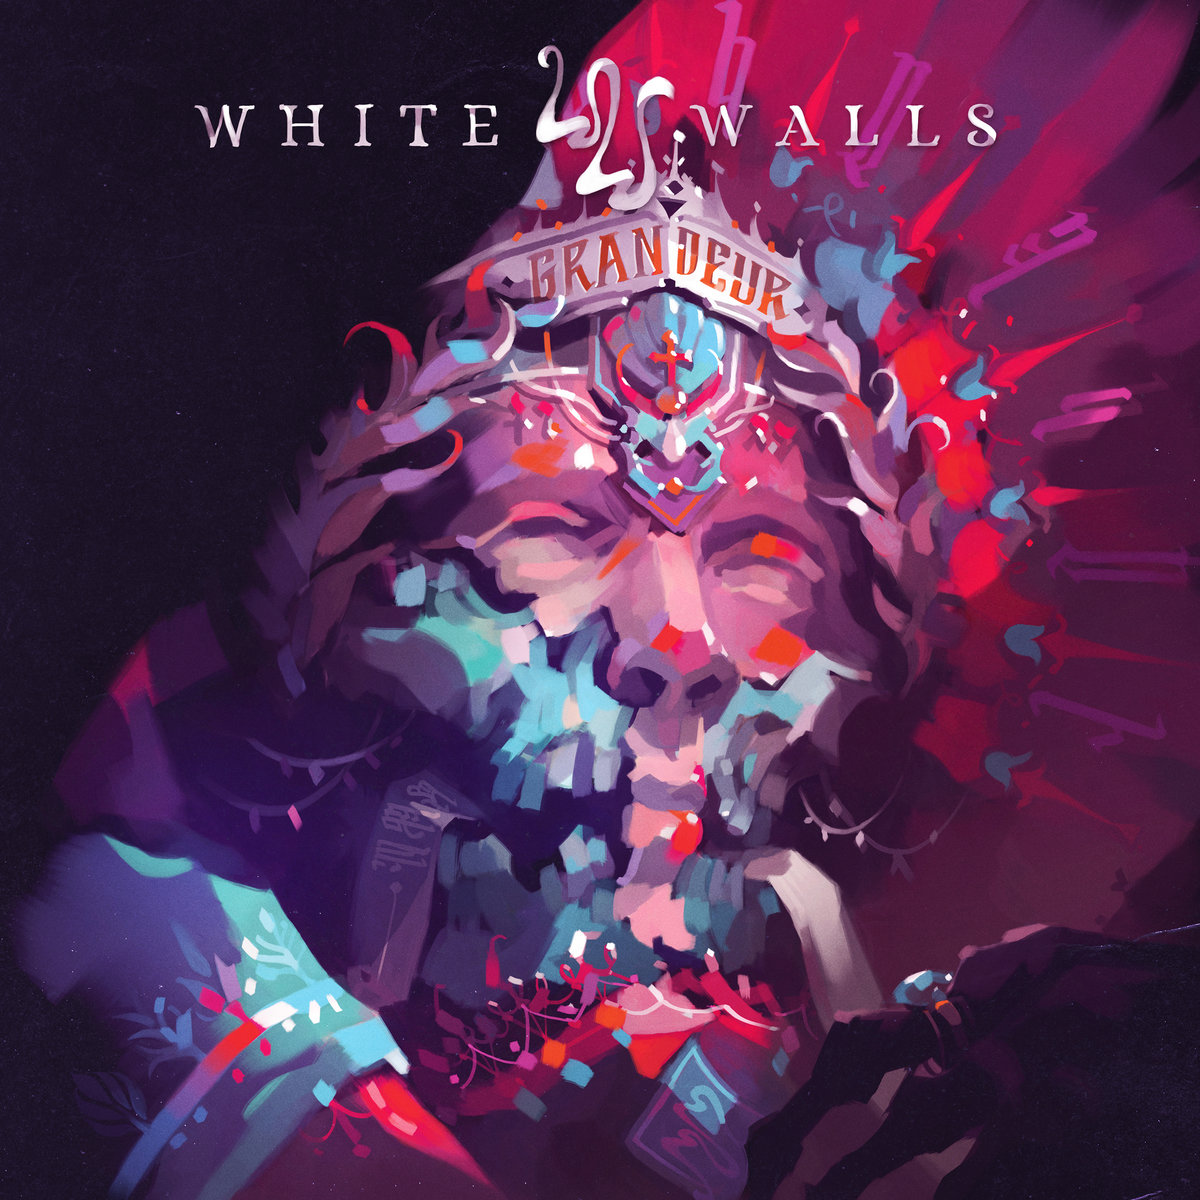 White Walls: Grandeur